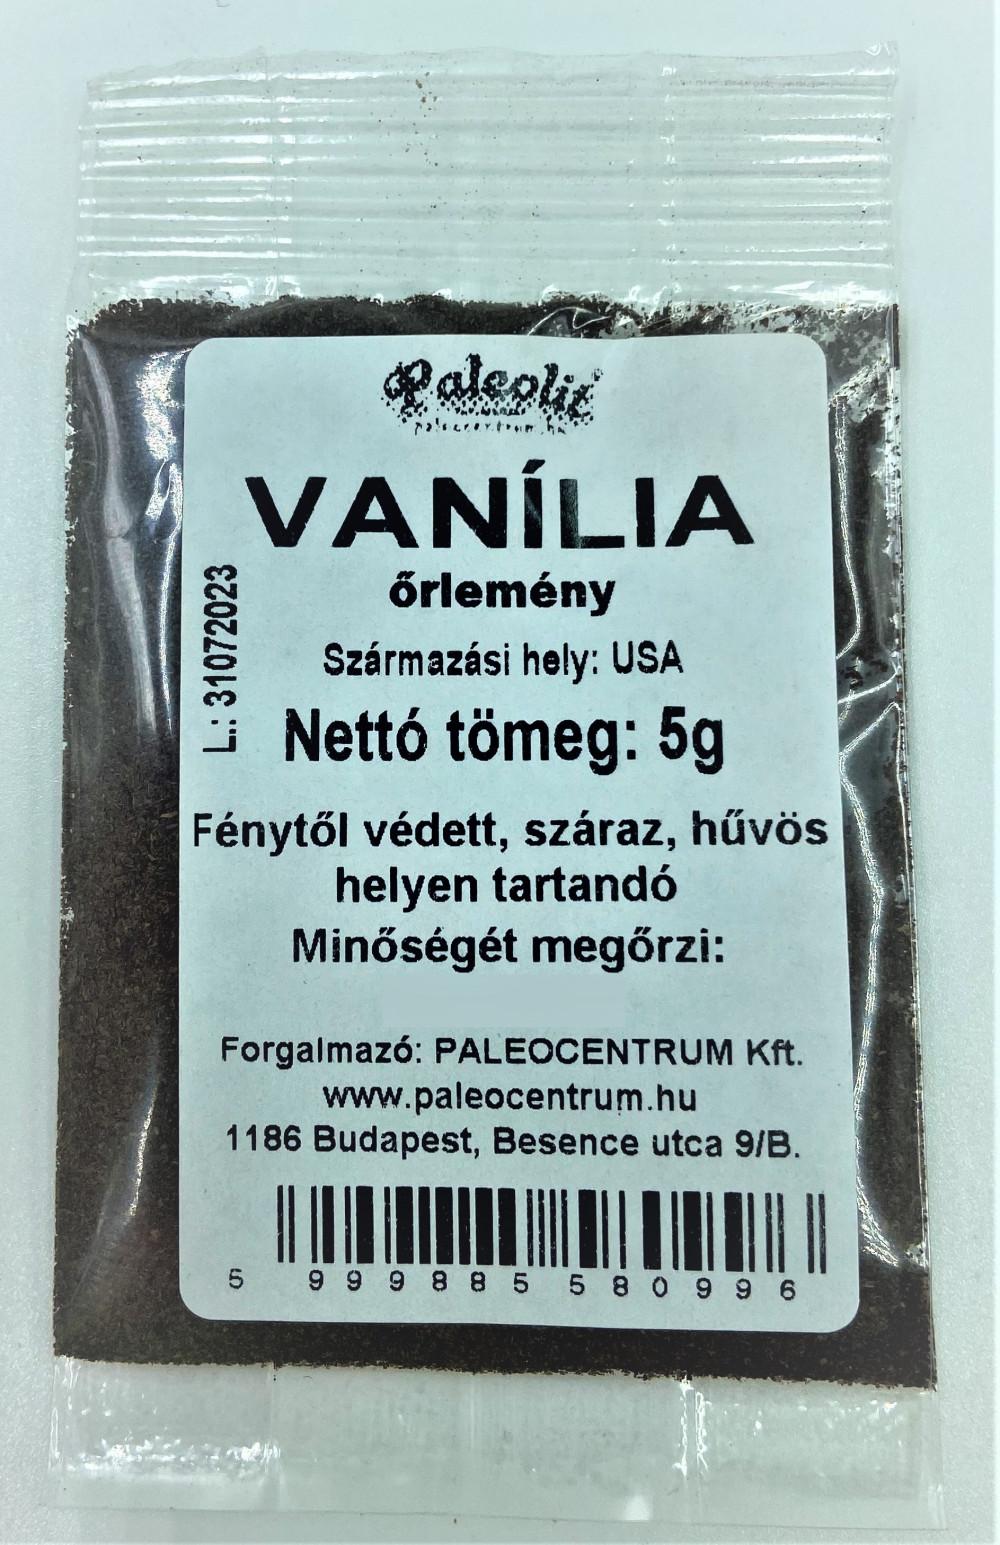 Vanília őrlemény, Madagaszkári Bourbon 5g